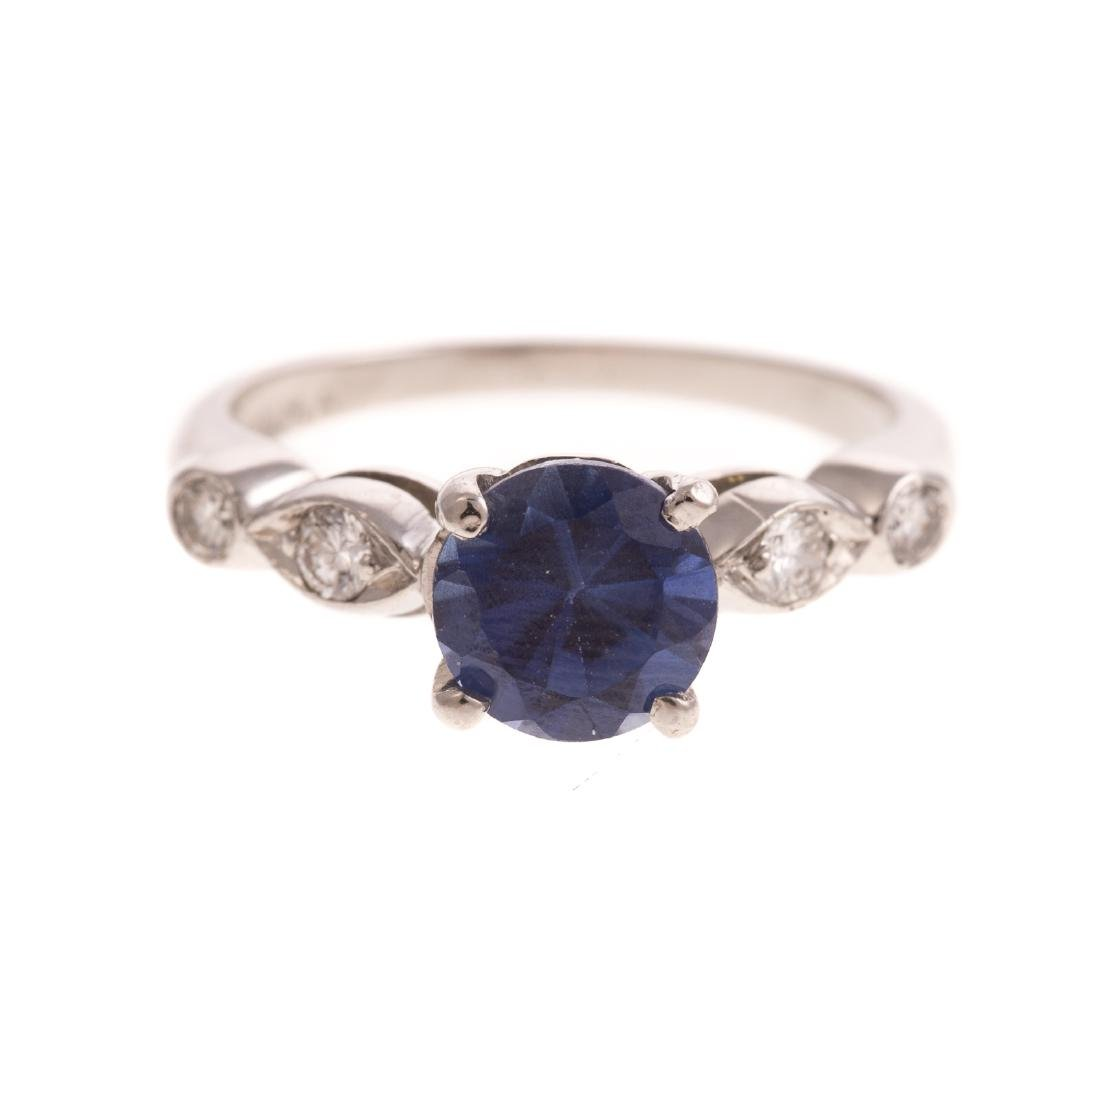 A Vintage Sapphire & Diamond Ring in Platinum